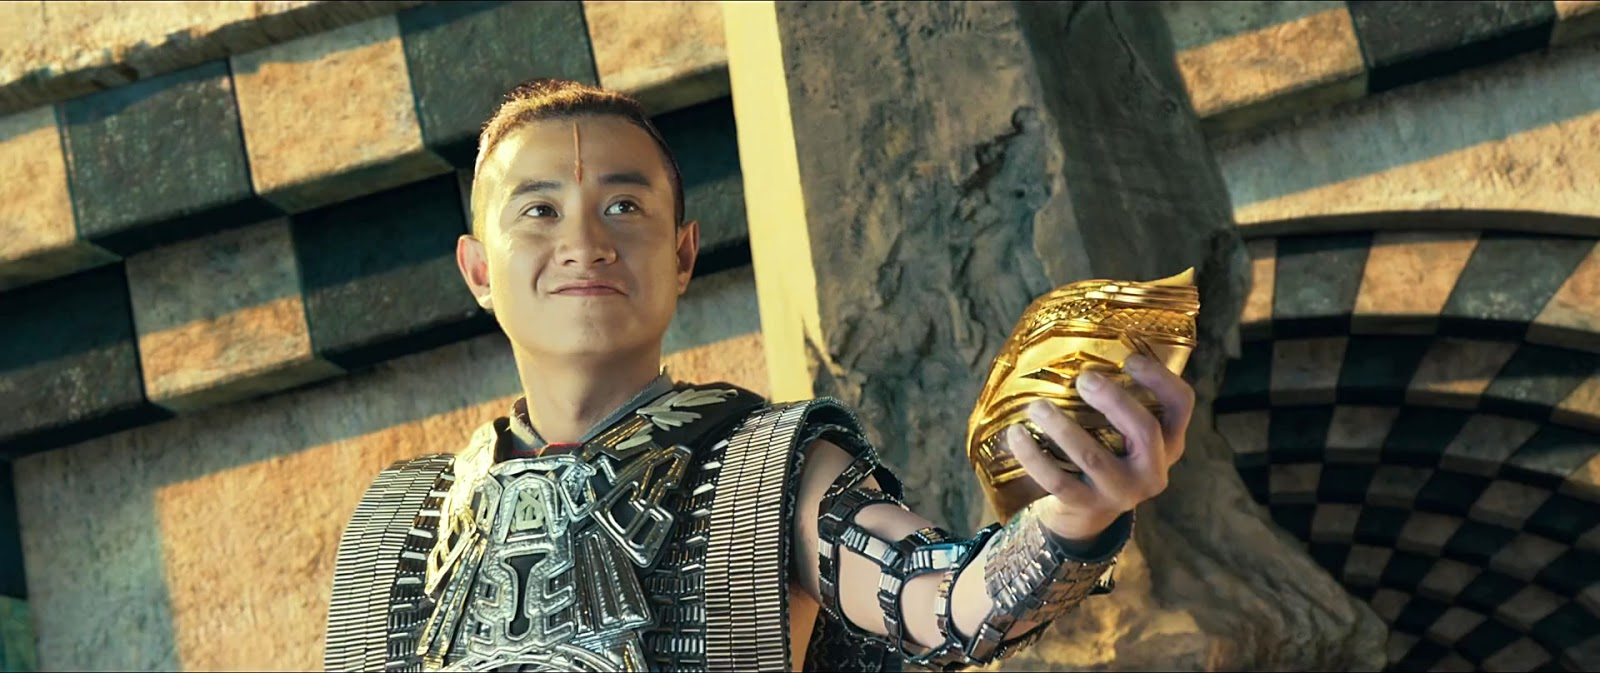 Screenshot League Of God (2016) Chinese BluRay 1080p 5 CH - www.uchiha-uzuma.com 02